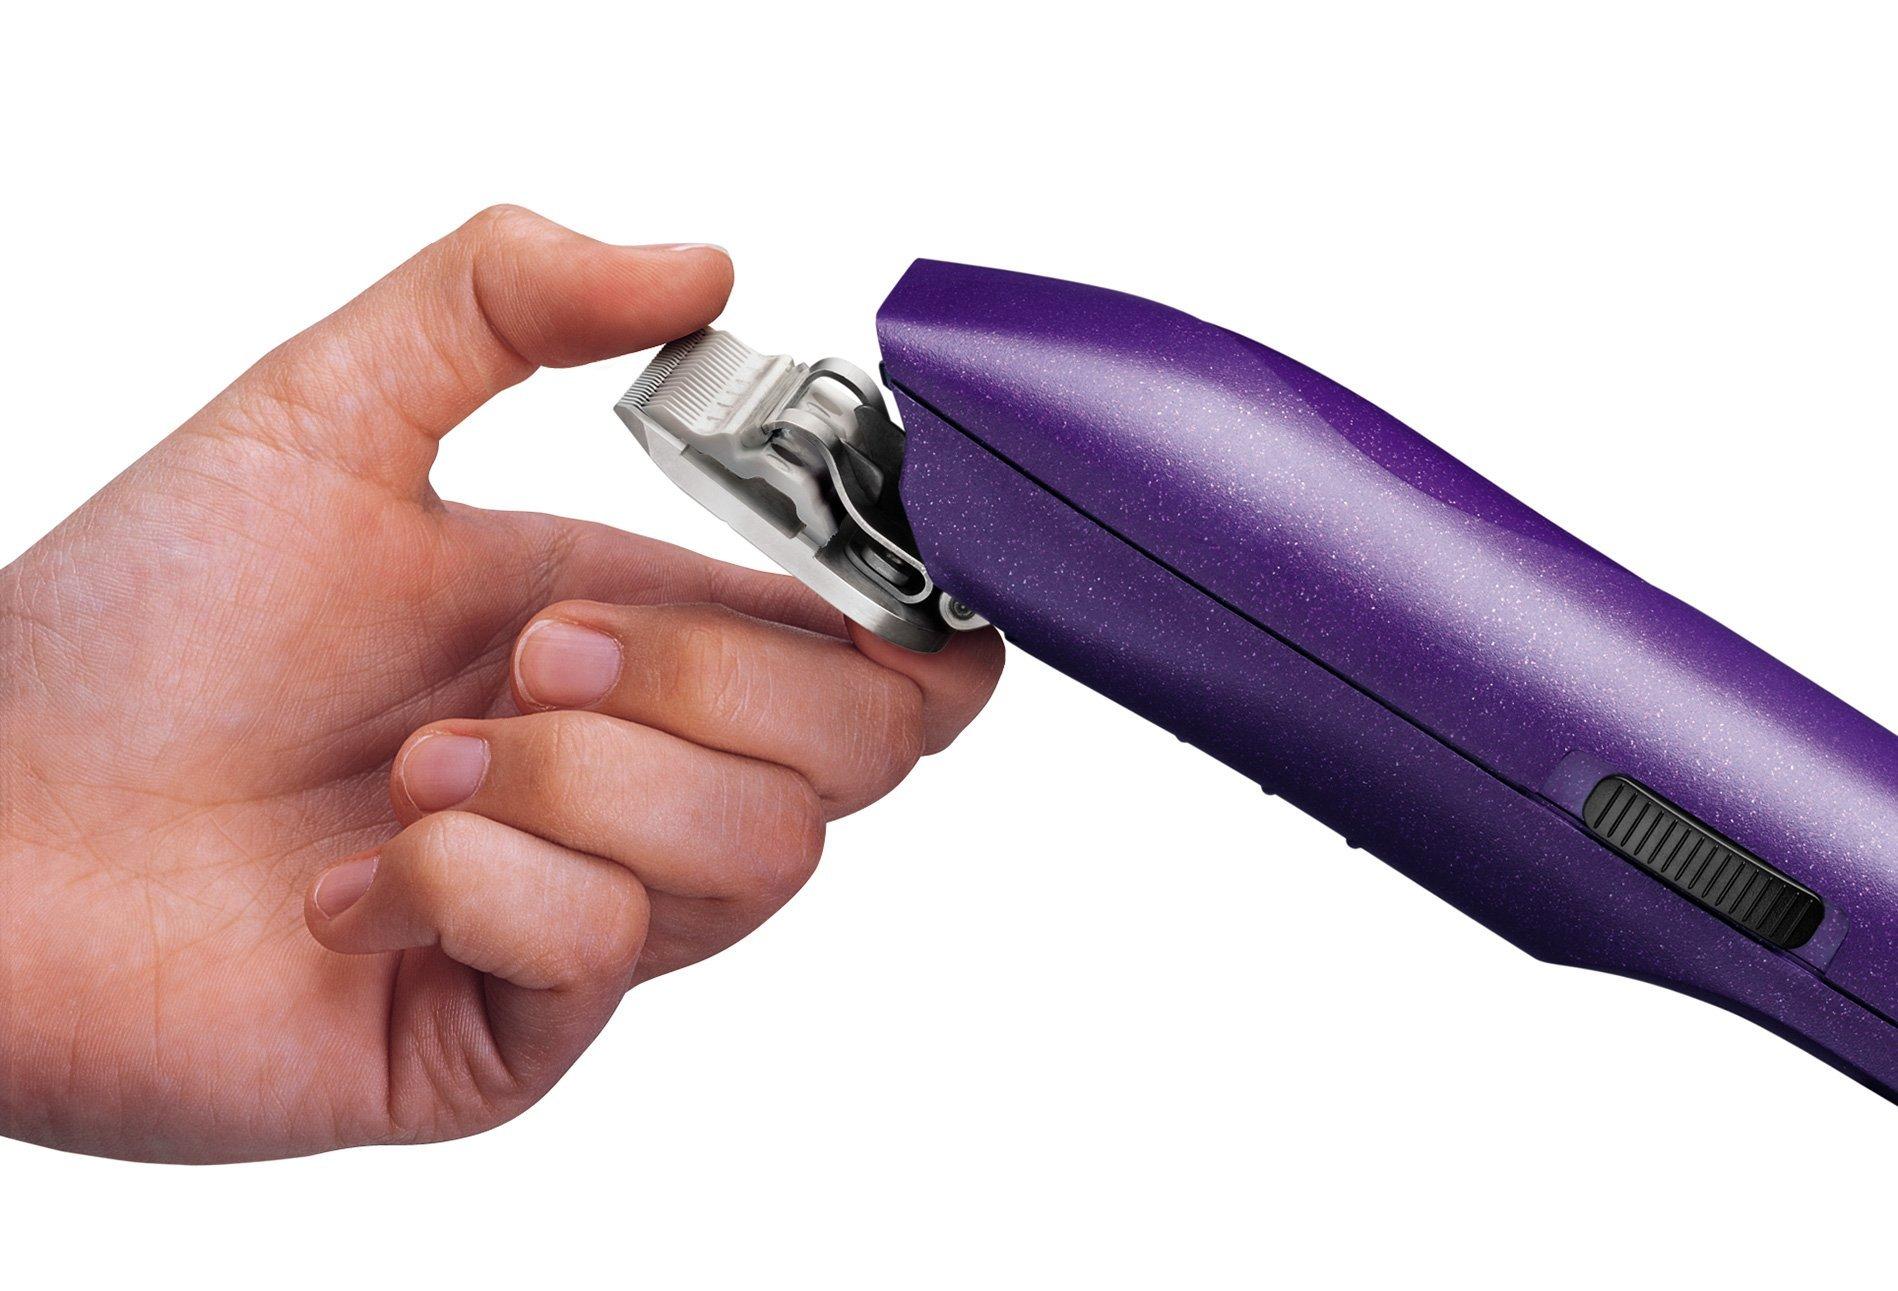 Andis EasyClip Pro-Animal 7-Piece Detachable Blade Clipper Kit, Animal/Dog Grooming, Purple MBG-2 (21420)